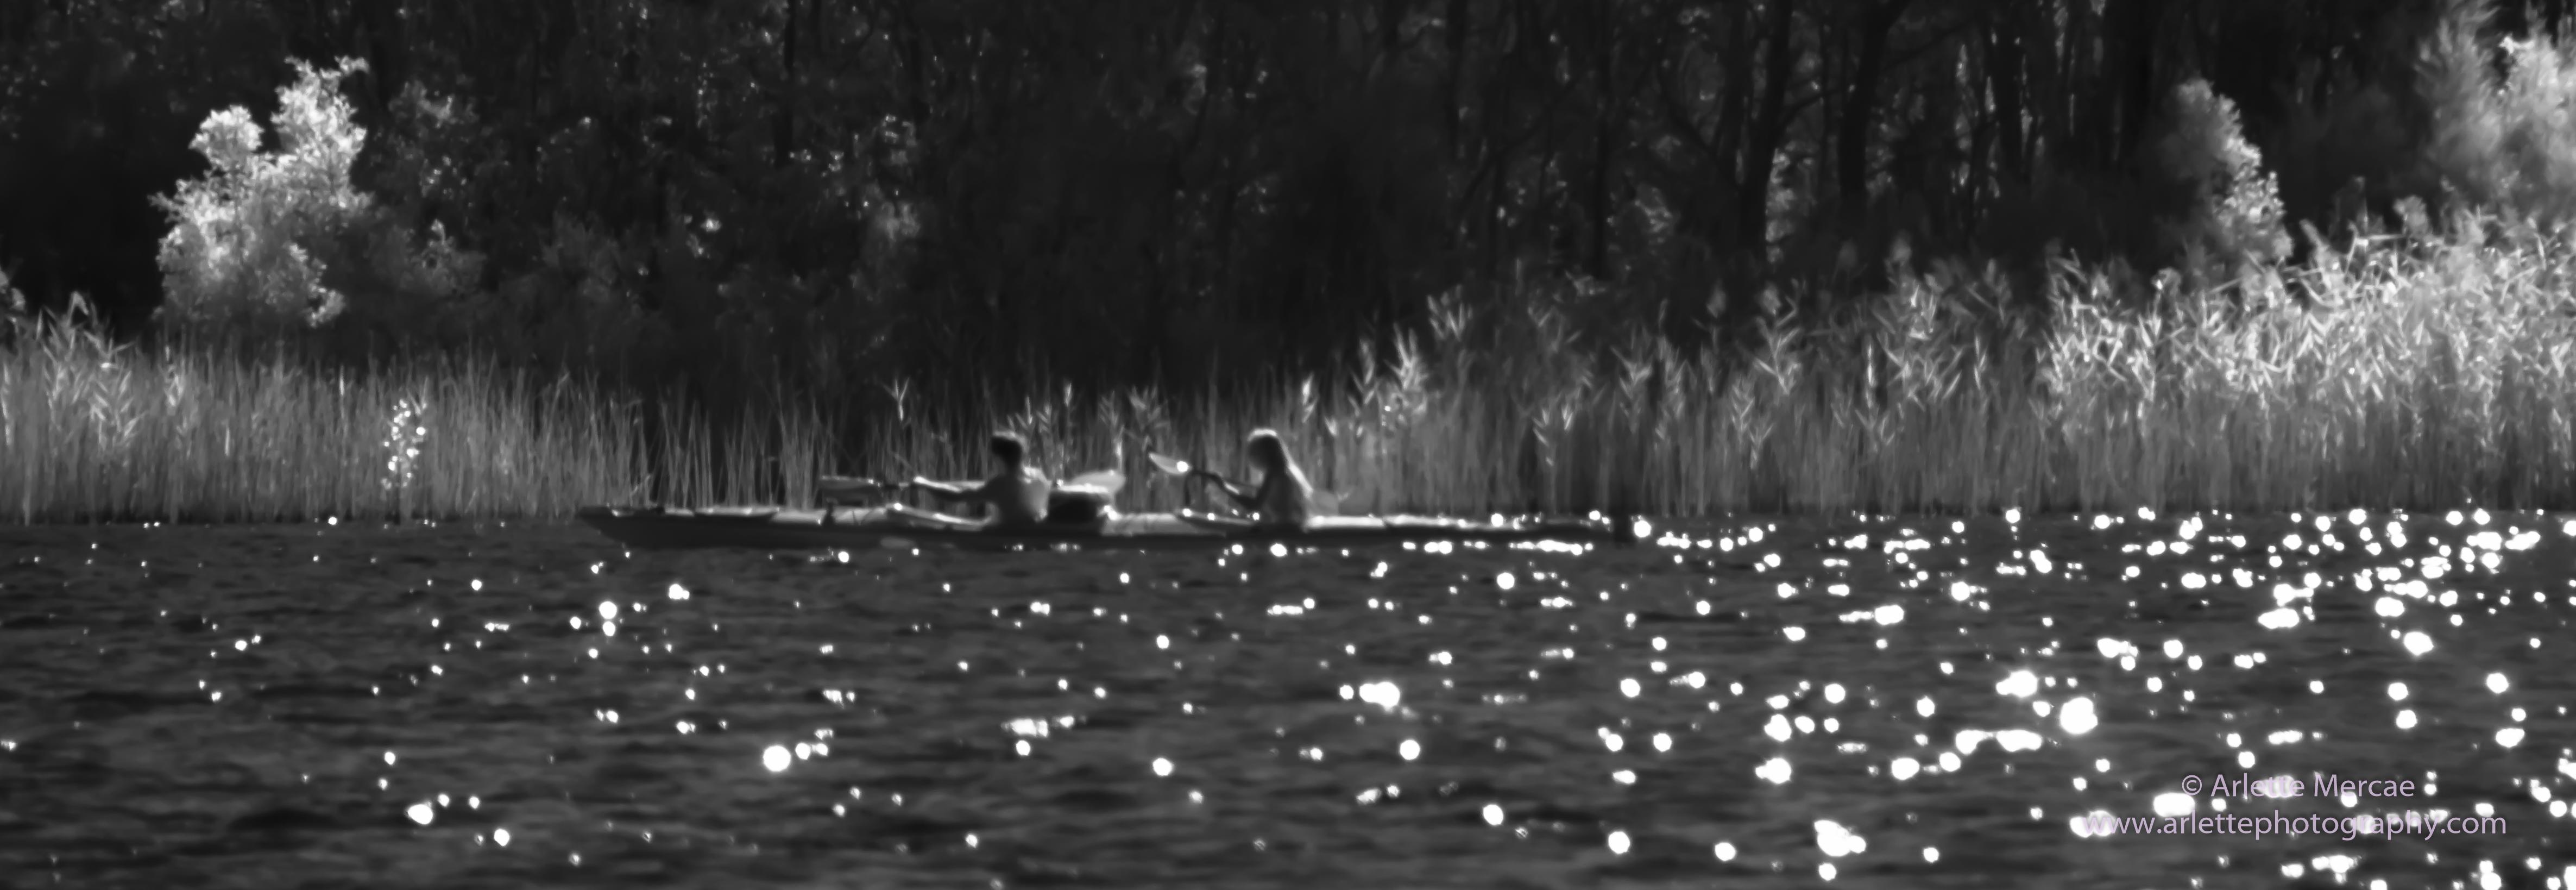 Noosa Everglades - 5